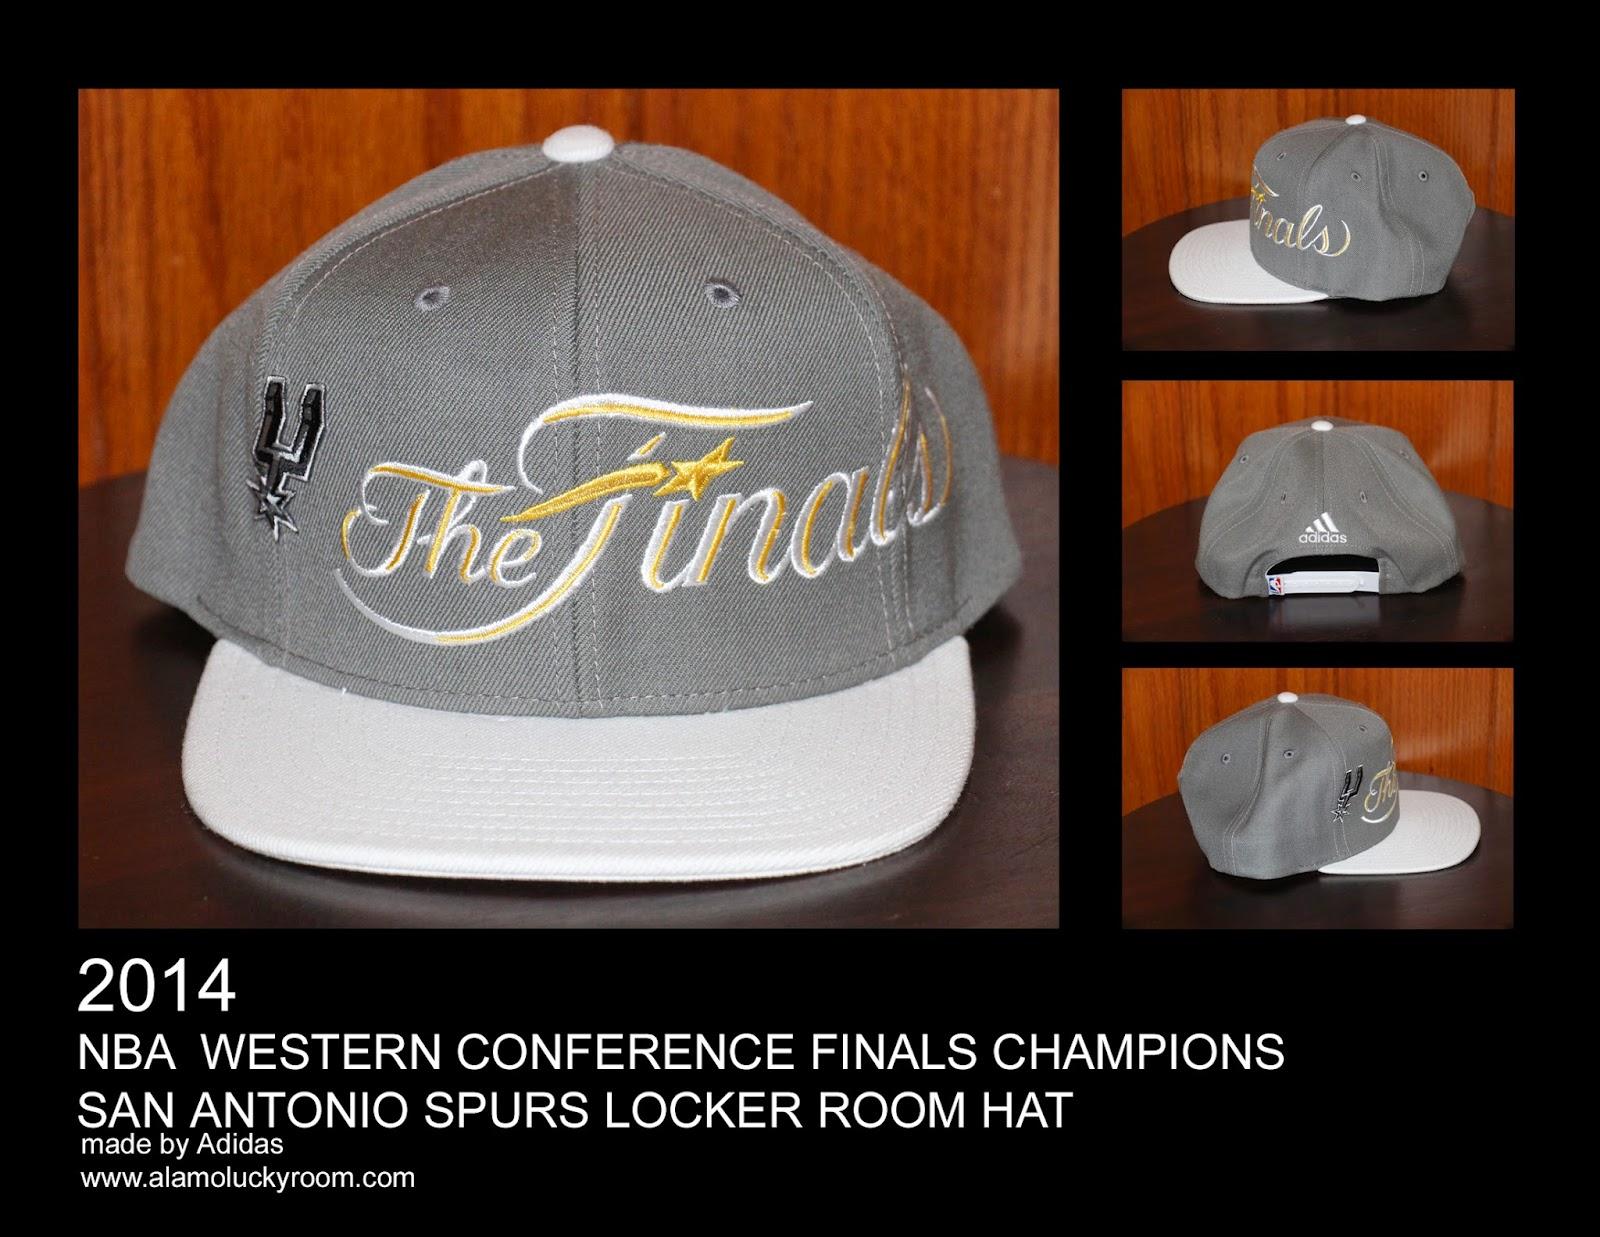 ee34902157e 2014 San Antonio Spurs NBA Western Conference Finals Champions Locker Room  Hat